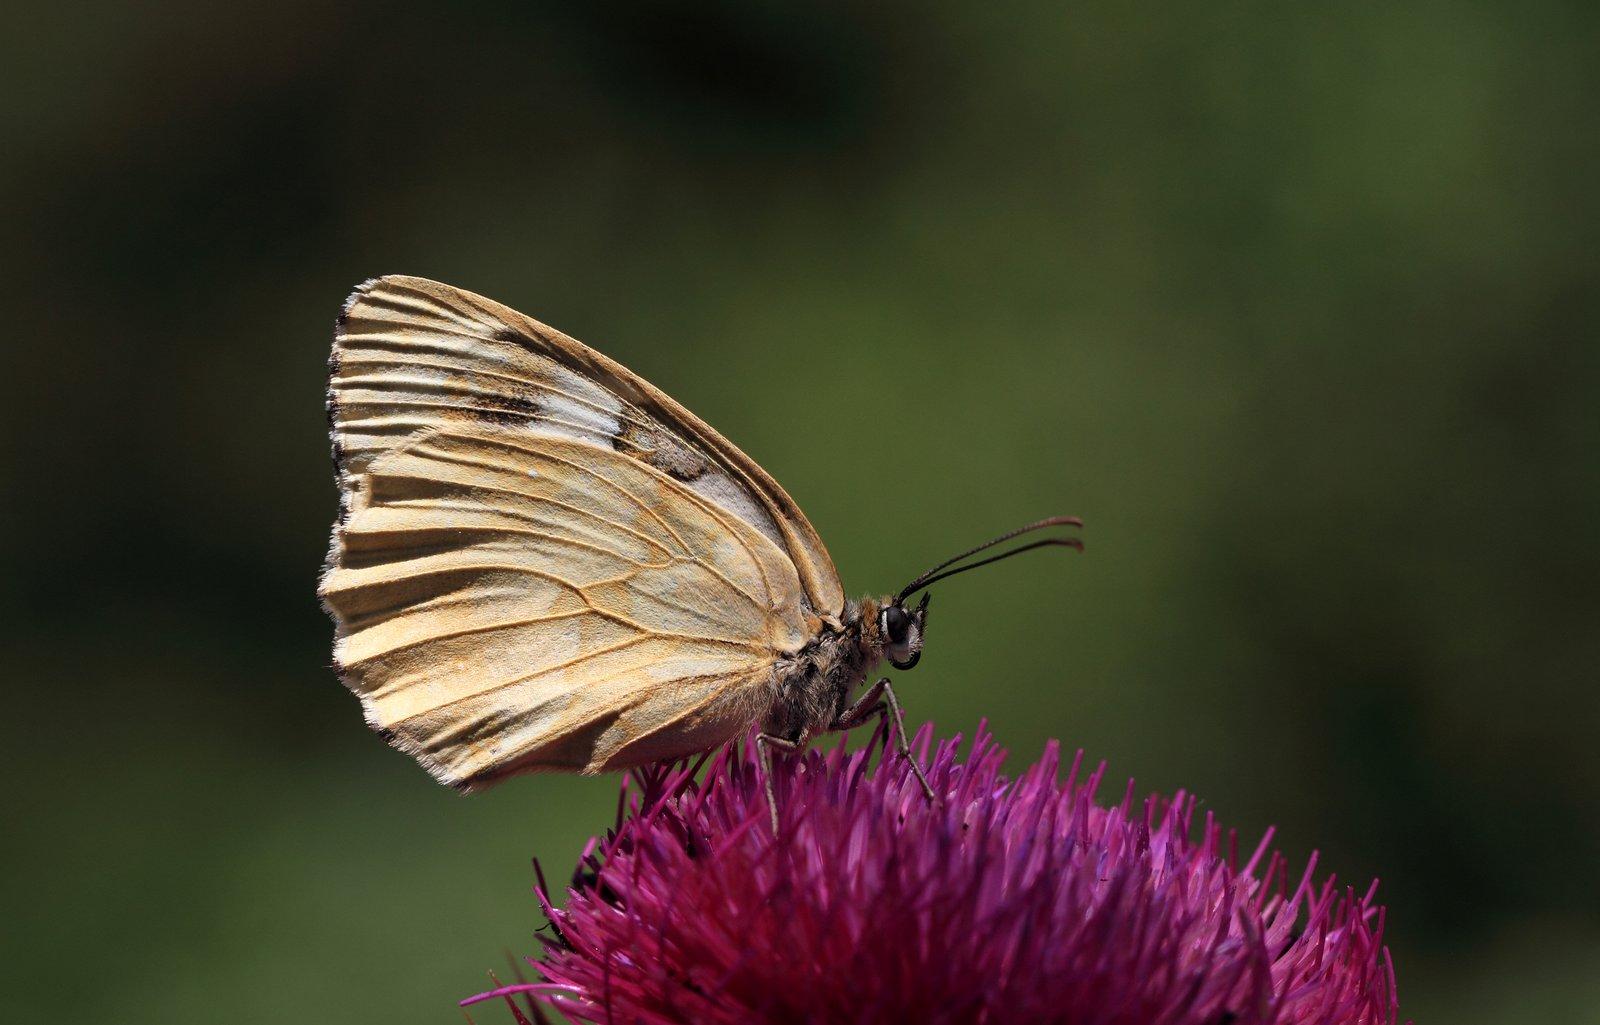 Skakbrætsommerfugl, Melanargia galathea